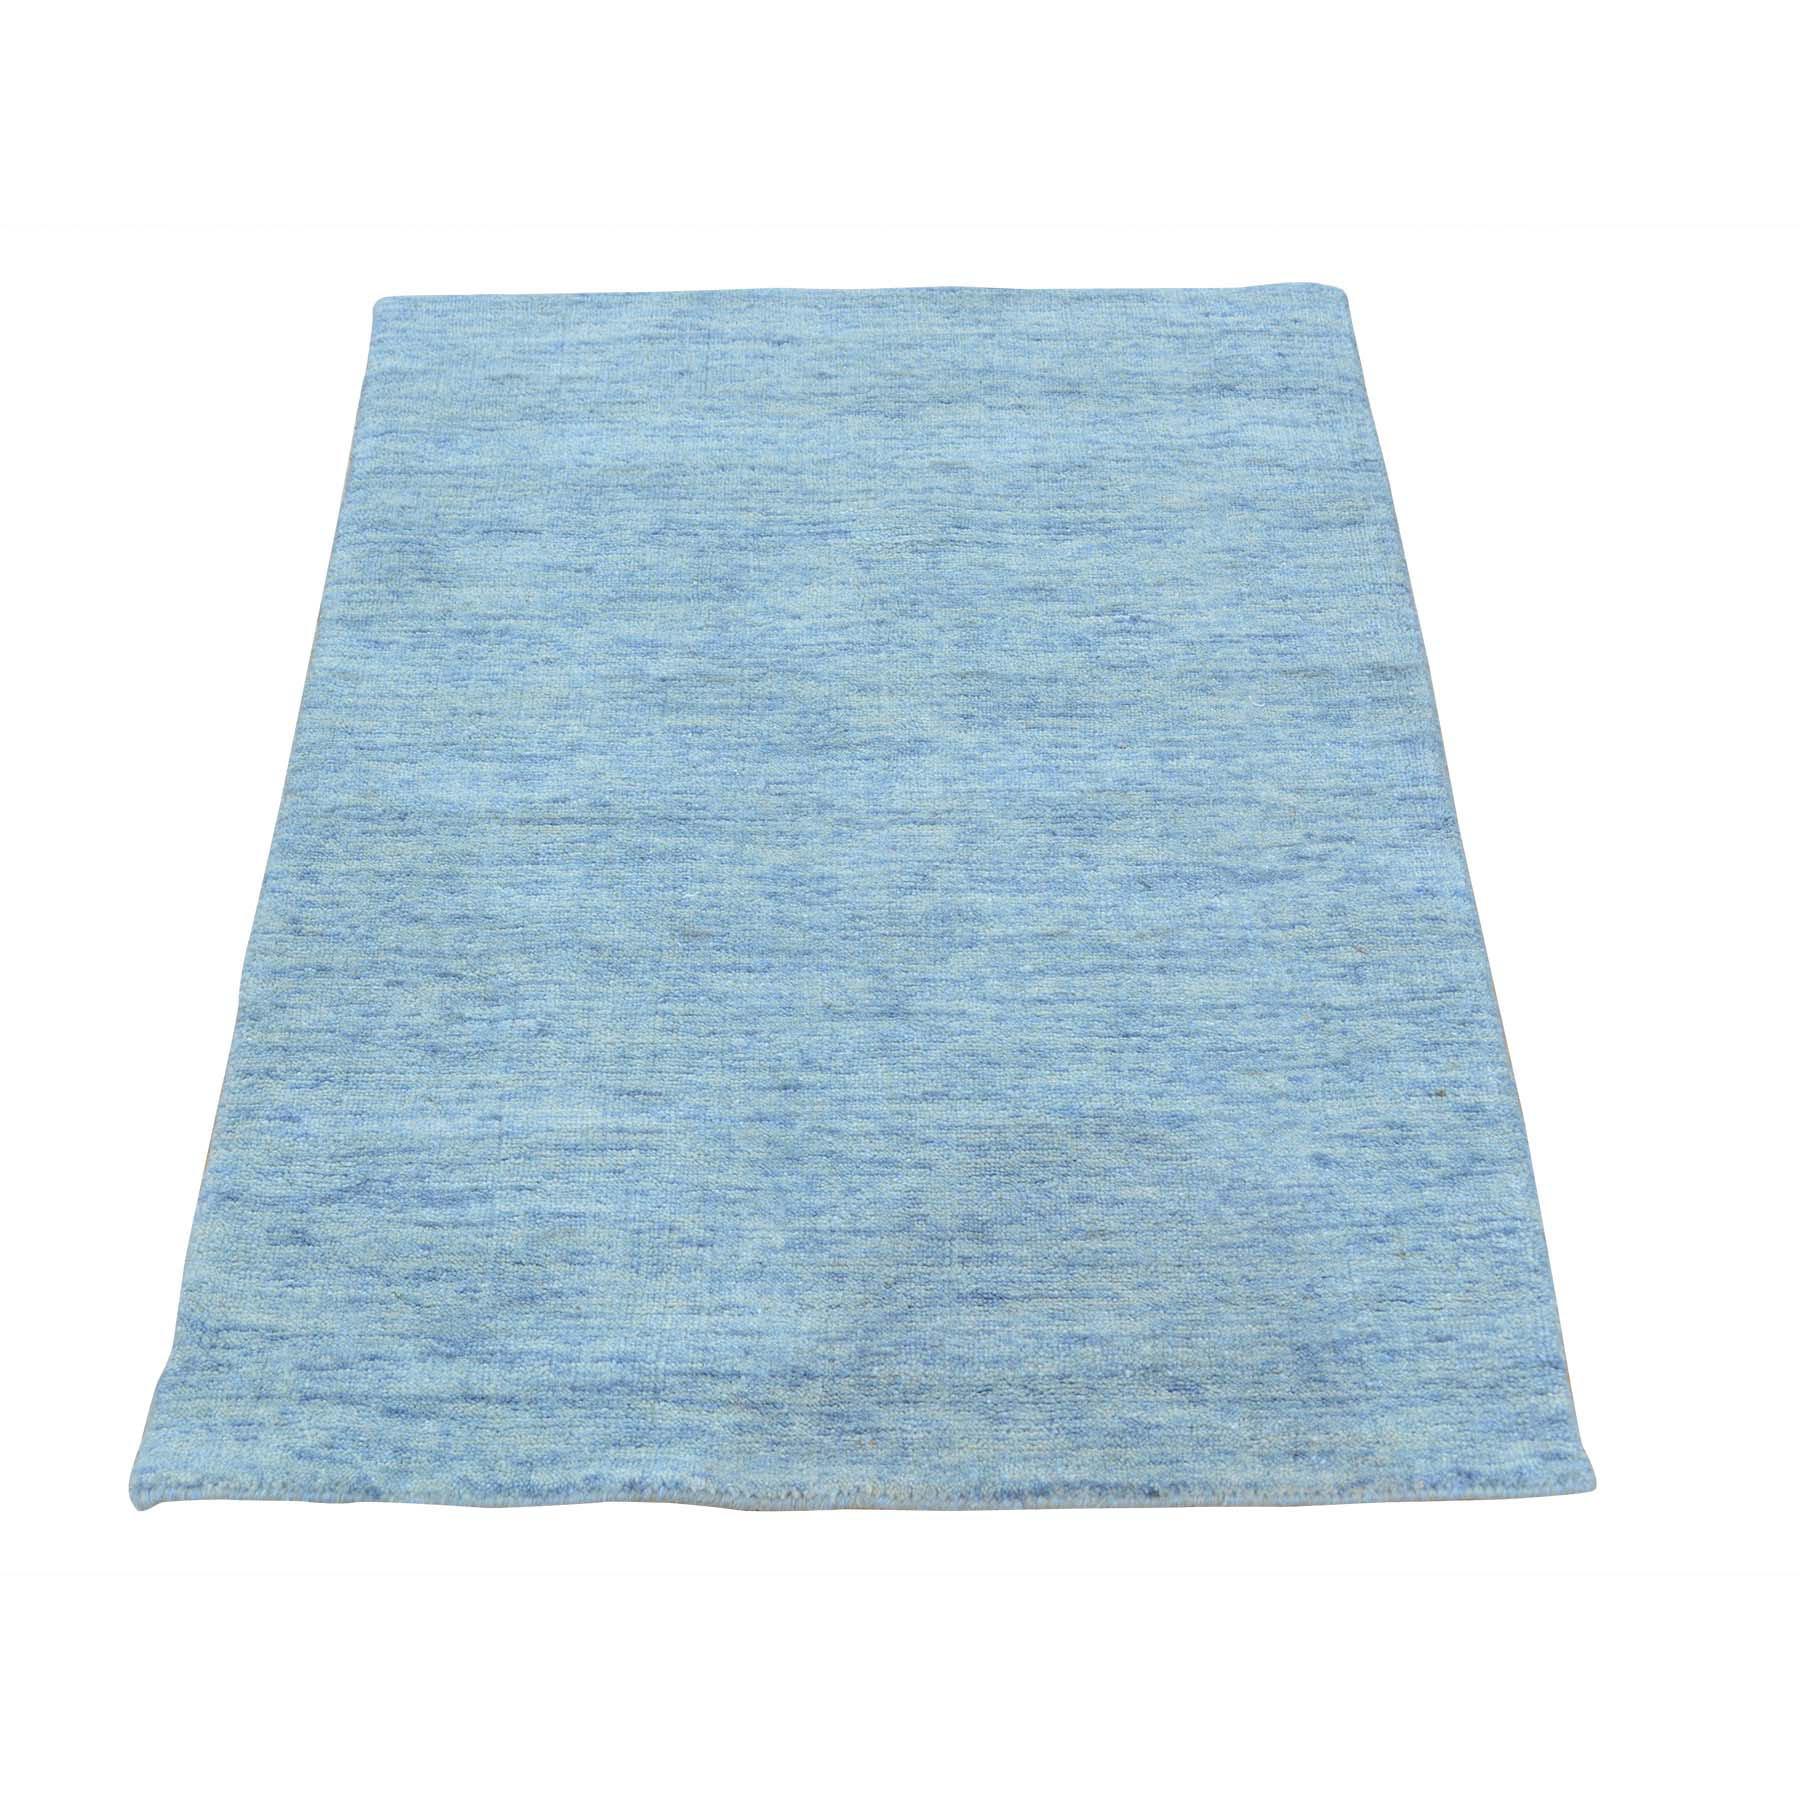 2'X3' Pure Wool Modern Hand Loomed Gabbeh Oriental Rug moab6db0